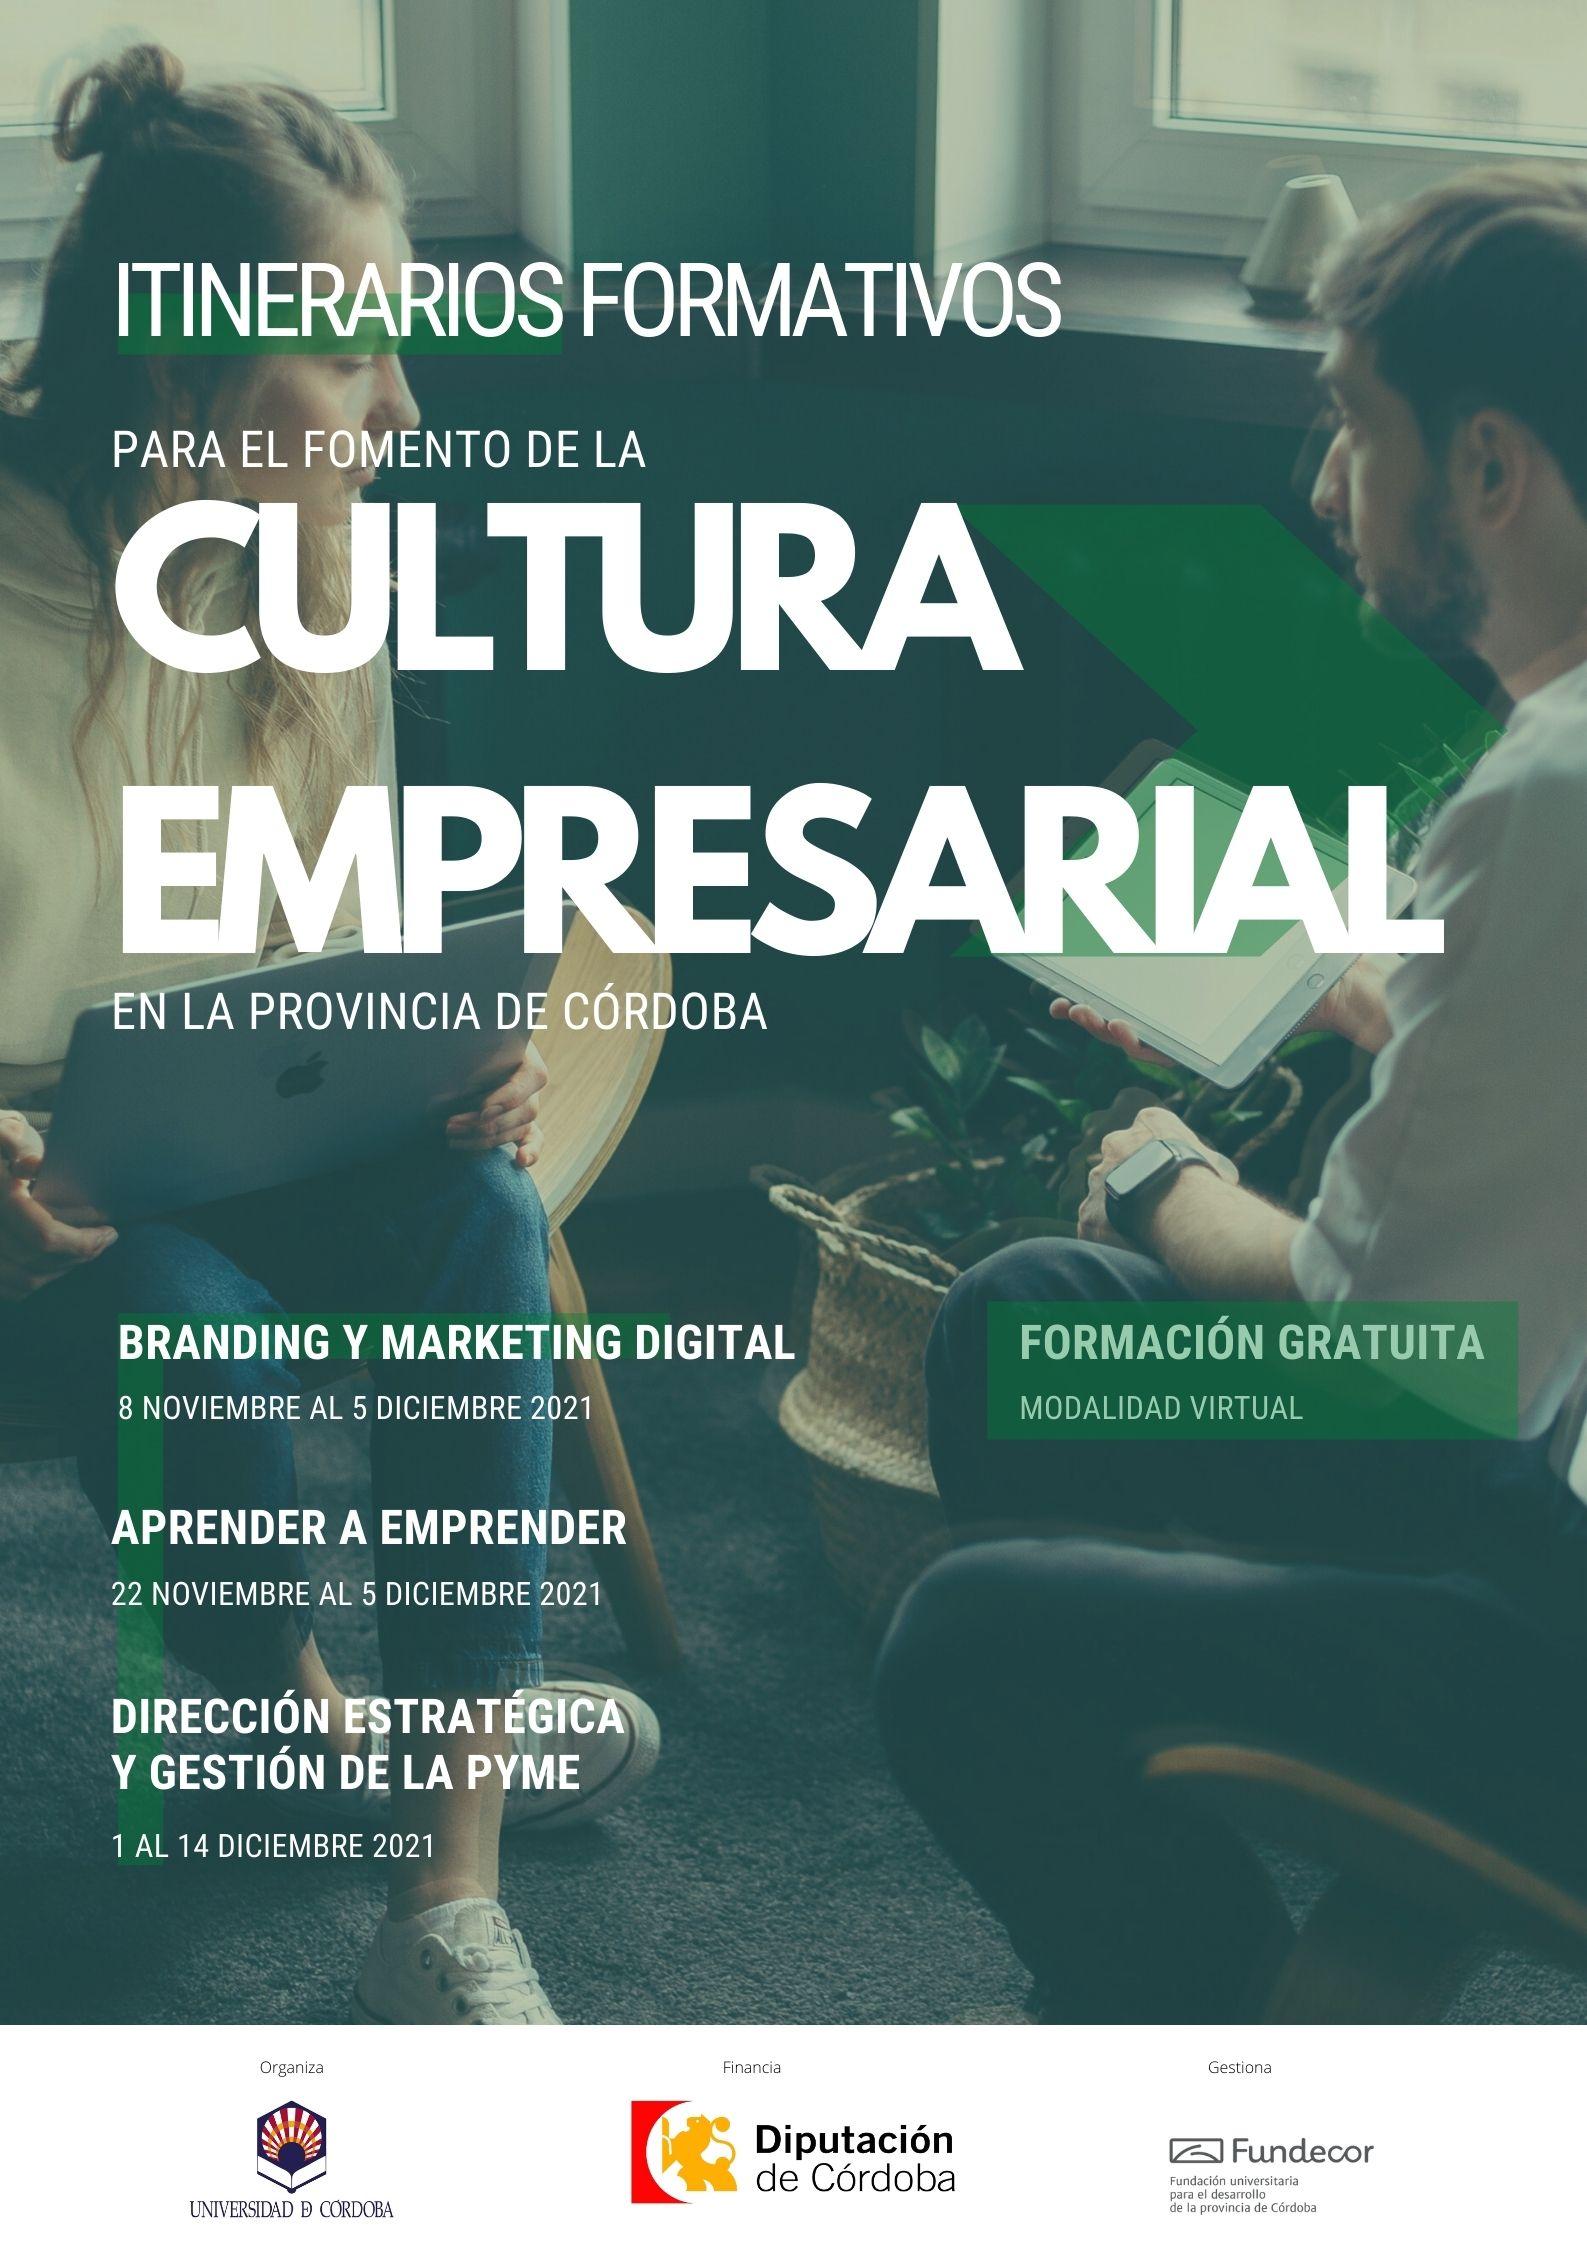 FORMACIÓN GRATUITA en cultura empresarial. Financia: Diputación de Córdoba